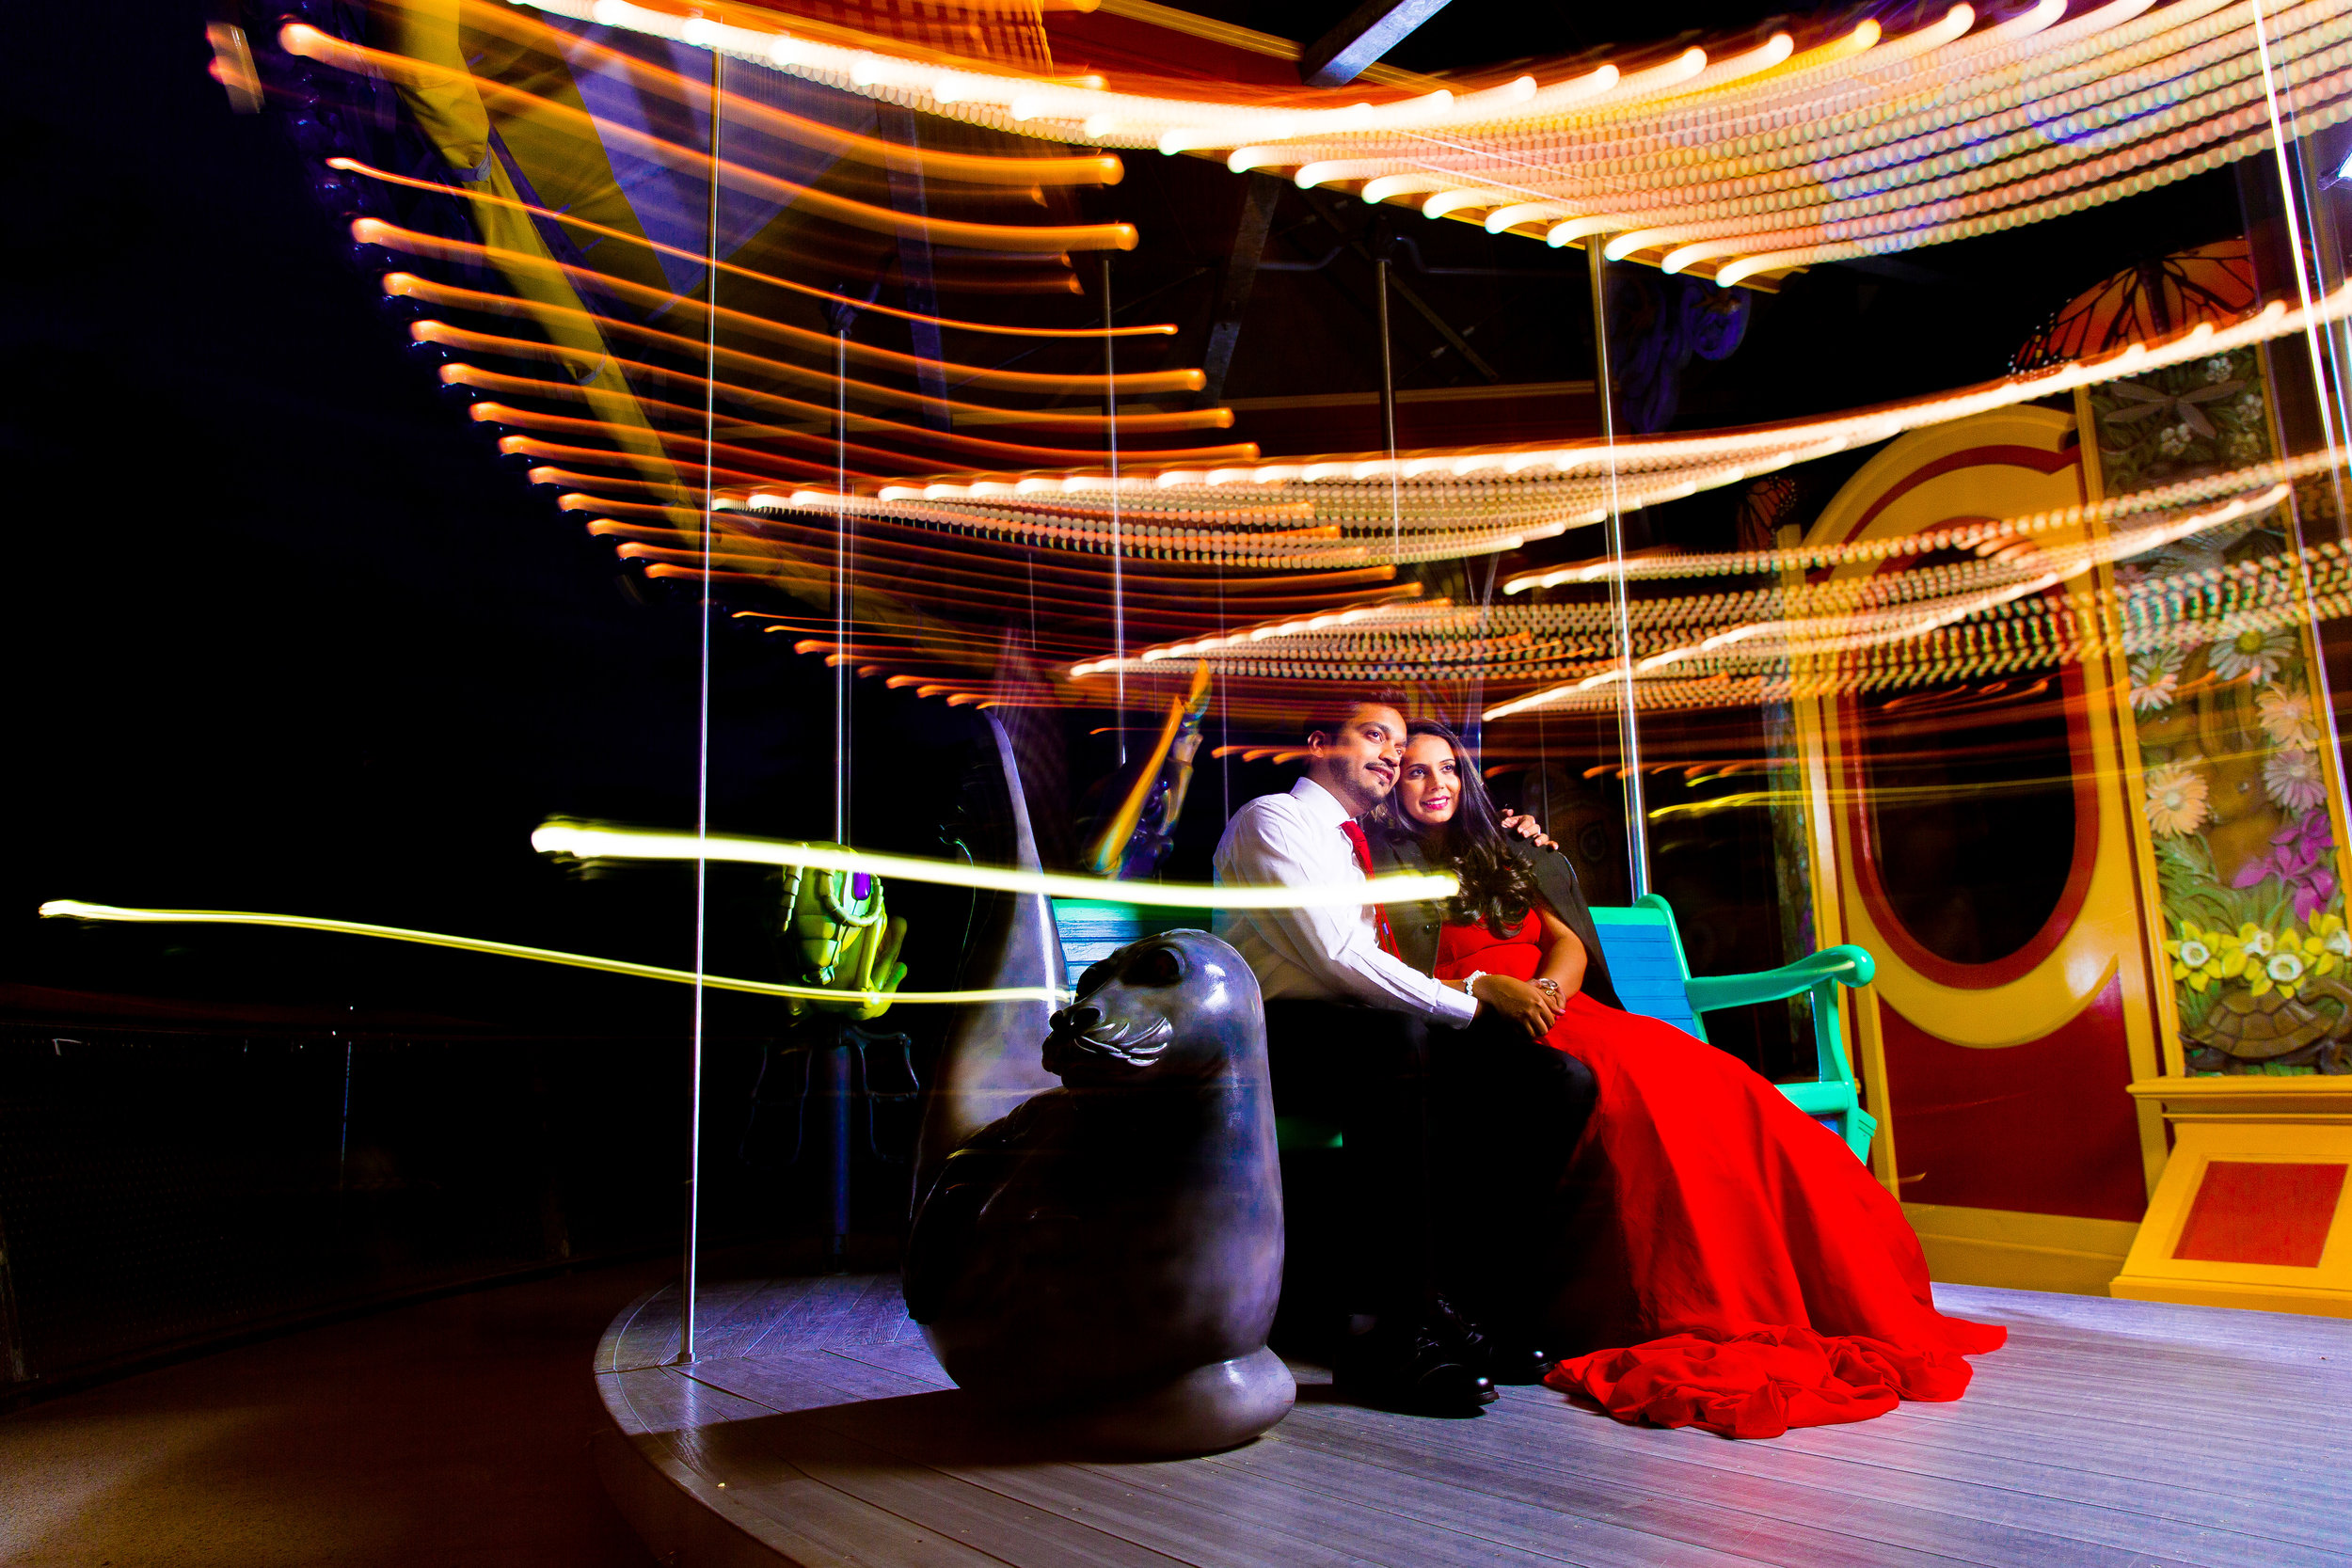 314A1187-Giovanni The Photographer-Boston Engagement Session-Christopher Columbus Park - Boston Waterfront.jpg